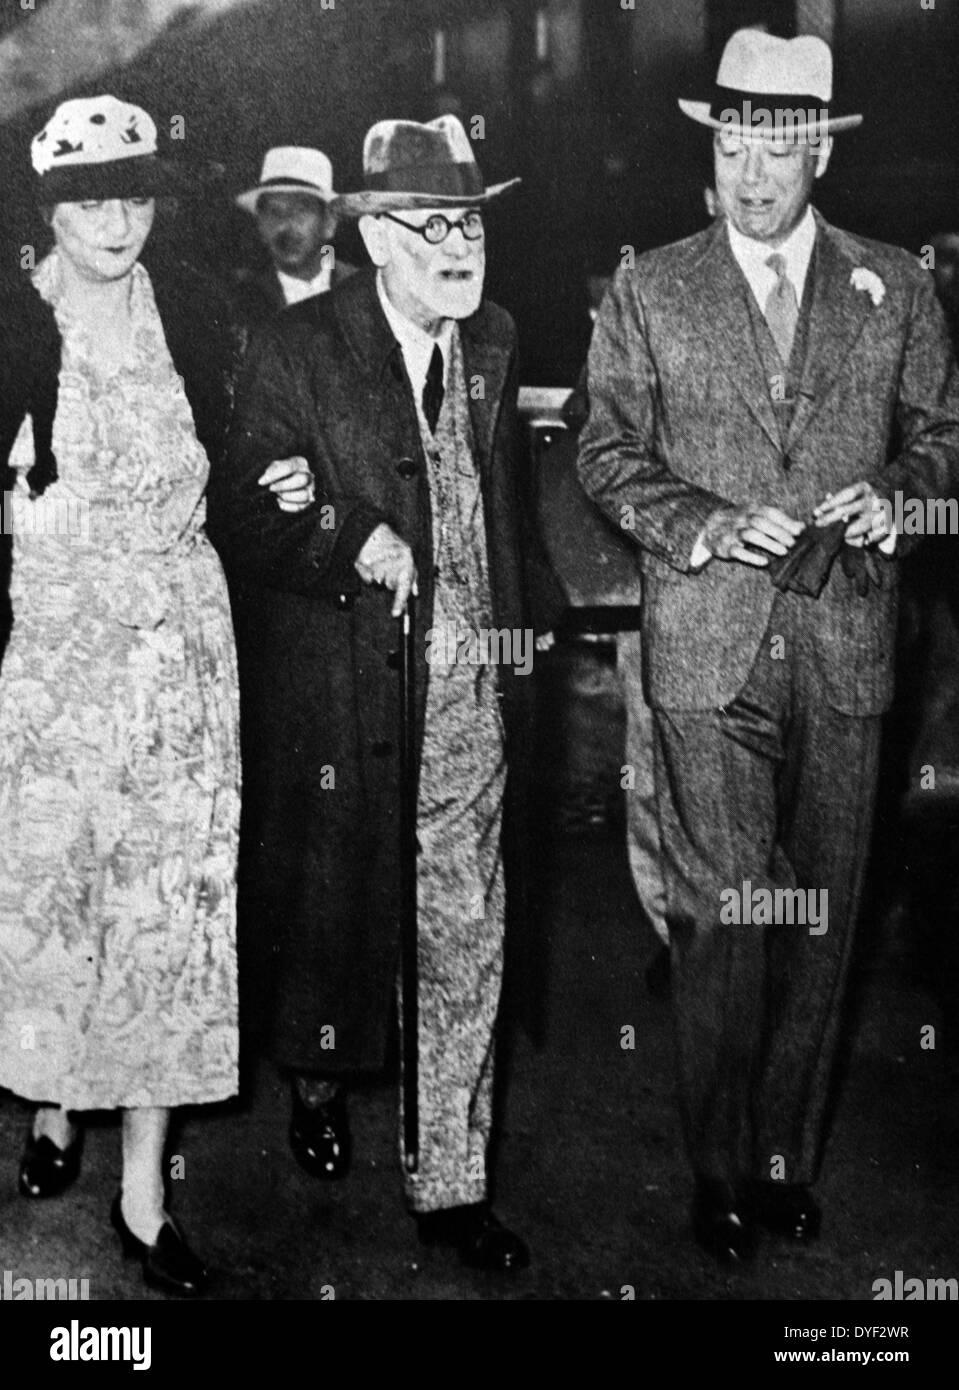 Photograph of Sigmund Freud, an Austrian neurologist - Stock Image